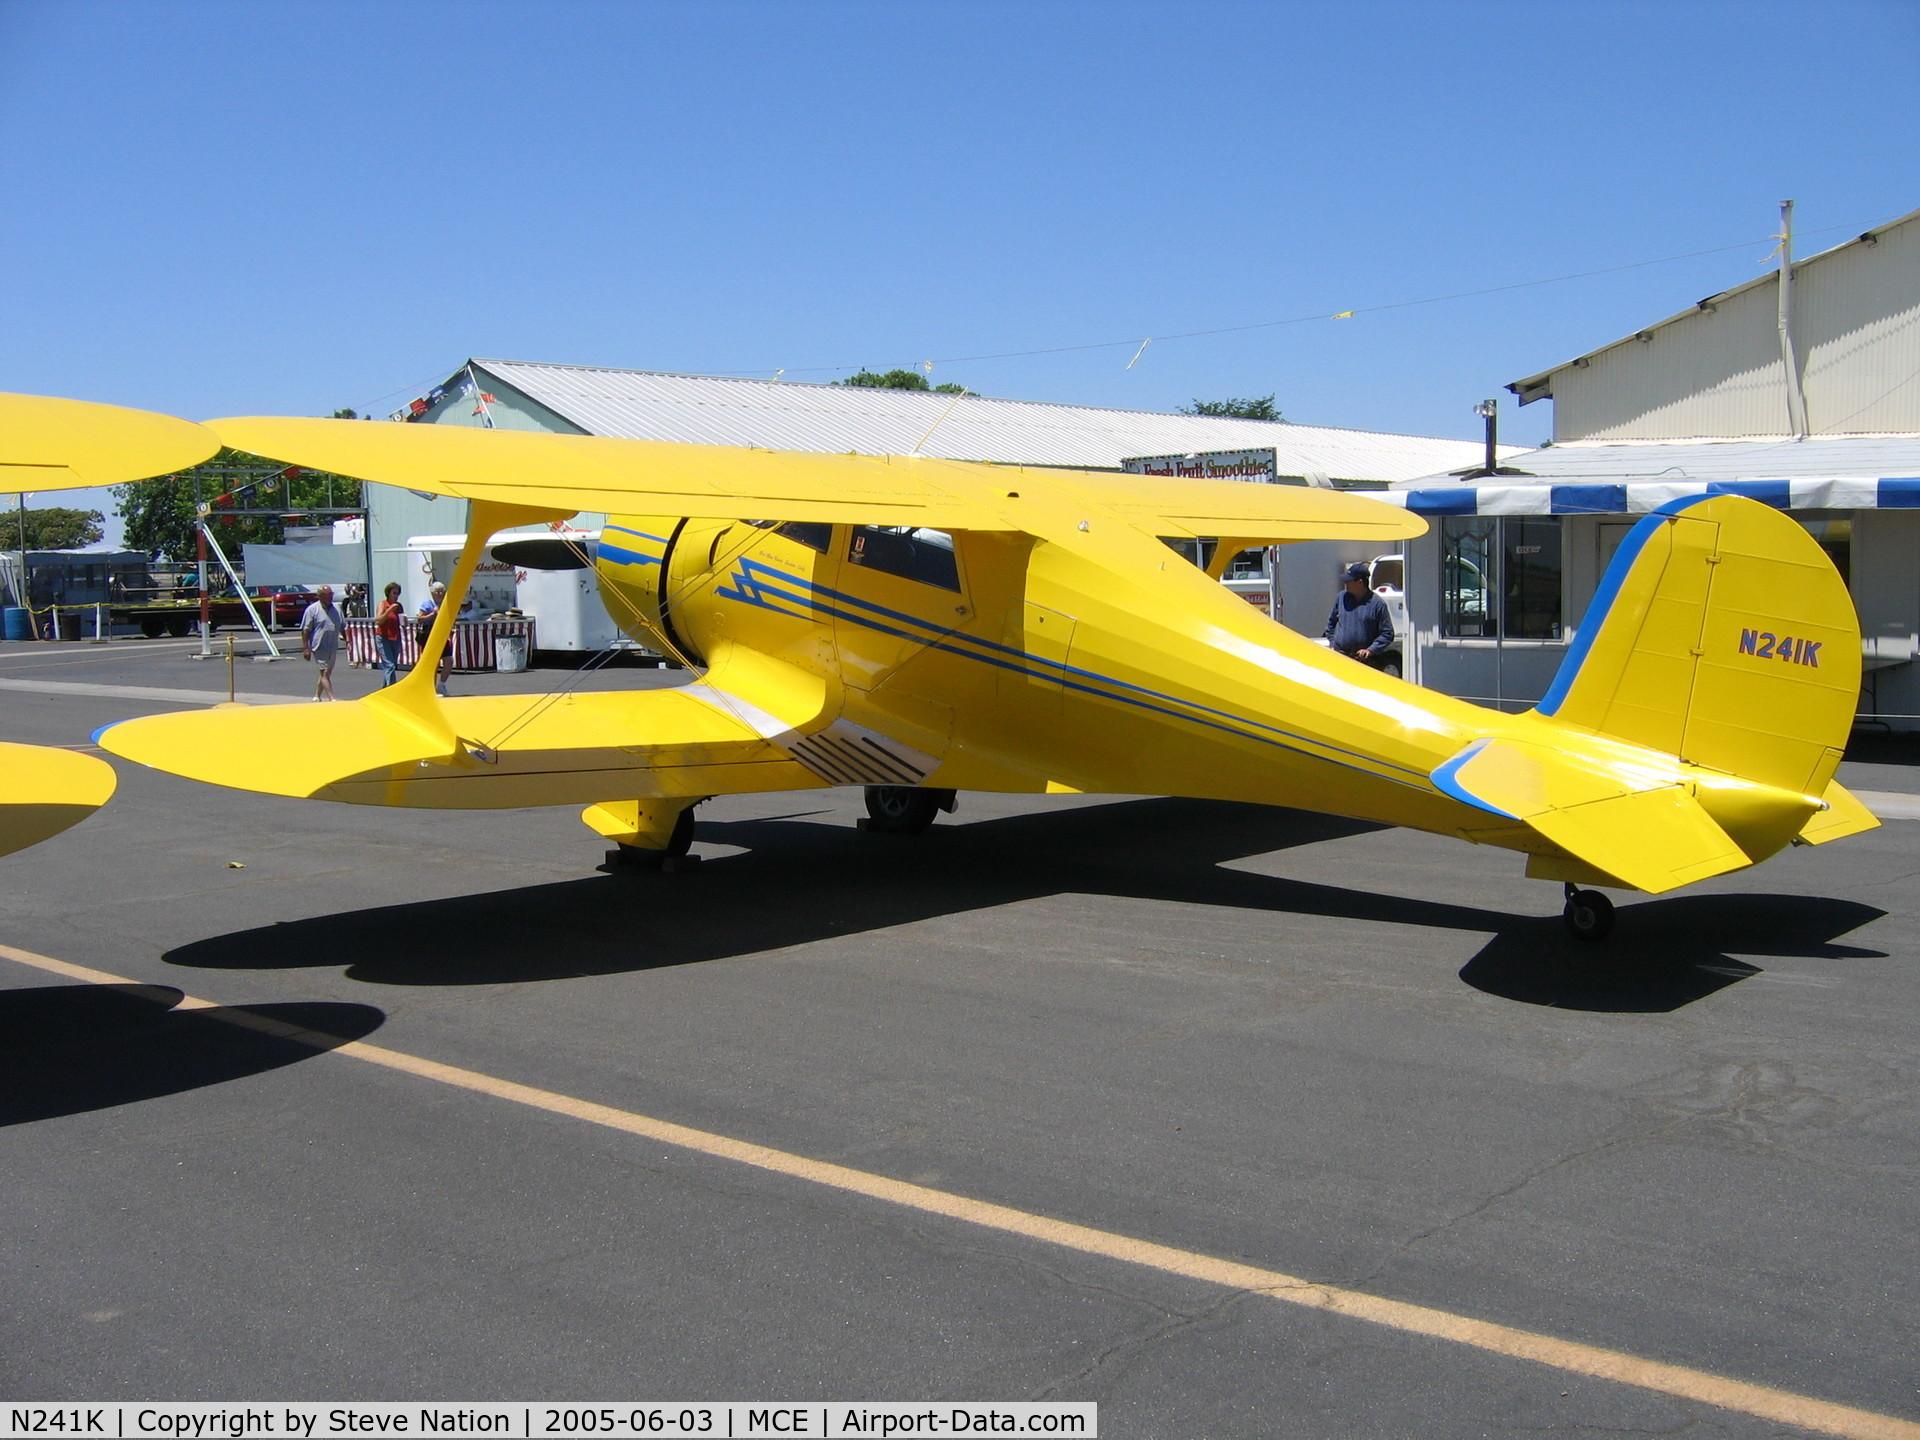 N241K, 1939 Beech D17S Staggerwing C/N 287, Beautiful 1939 Beech D17S at Merced, CA